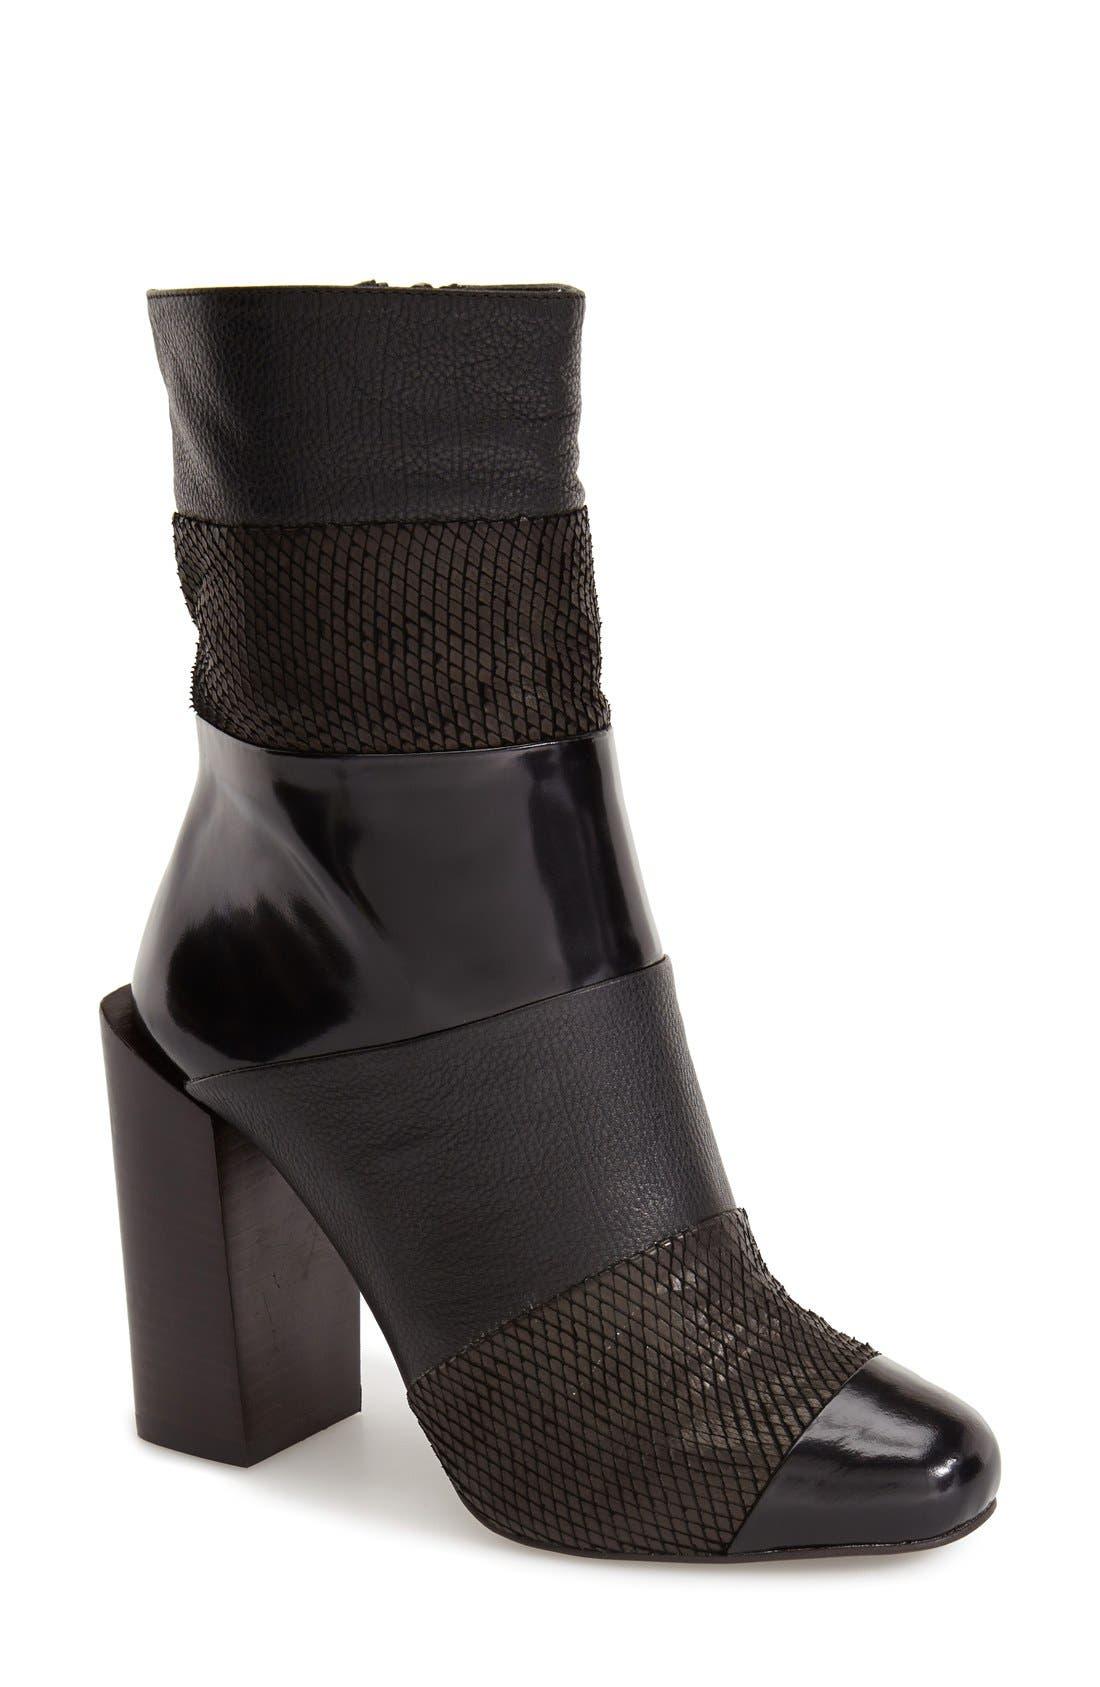 Alternate Image 1 Selected - Jeffrey Campbell 'Pezzi' Almond Toe Boot (Women)